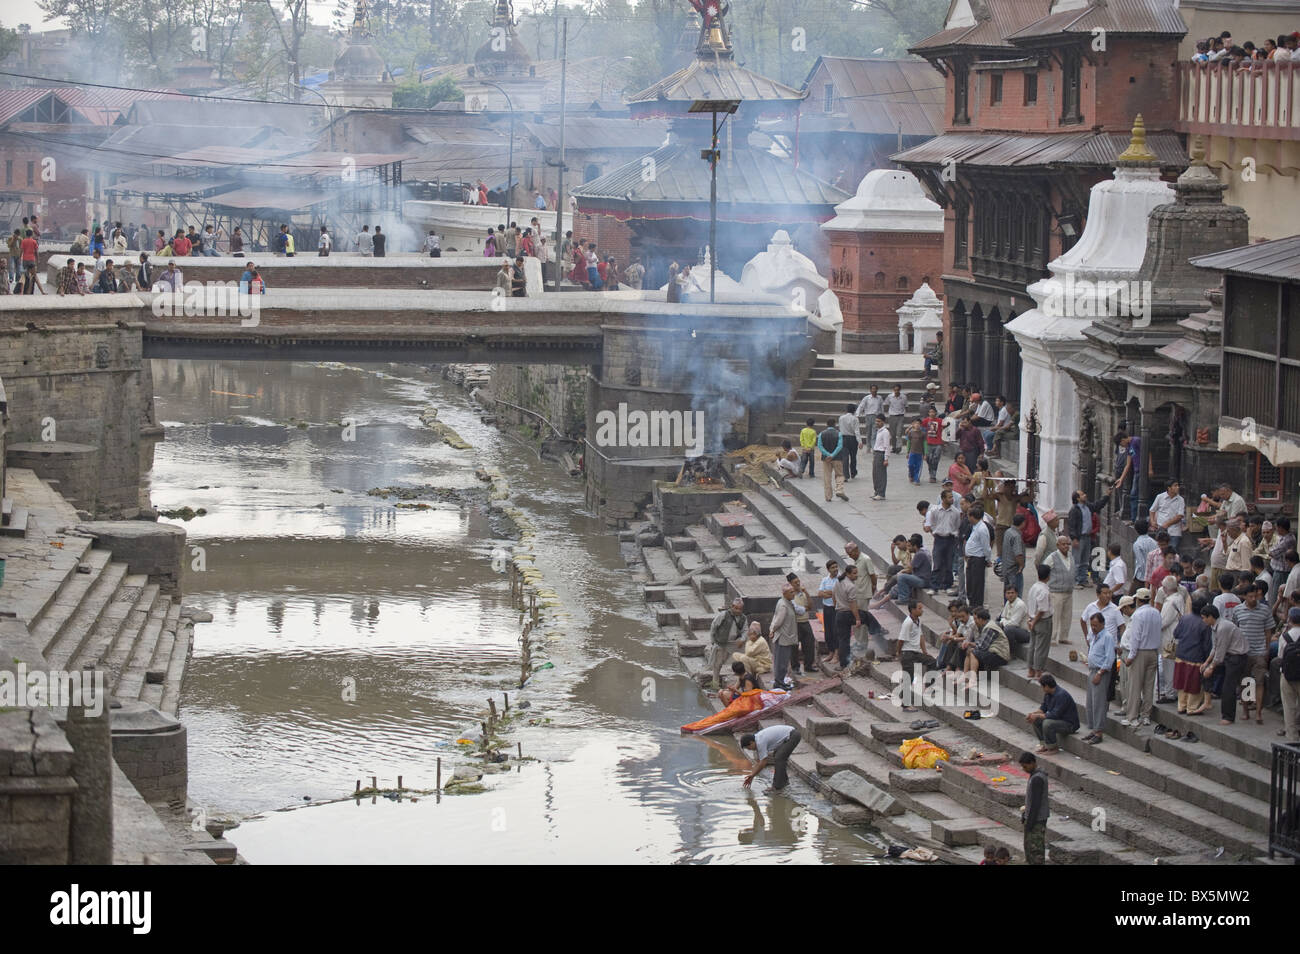 Arya Ghat cremation pyres, Hindu pilgrimage and cremation site, Pashupatinath, Kathmandu, Nepal, Asia - Stock Image